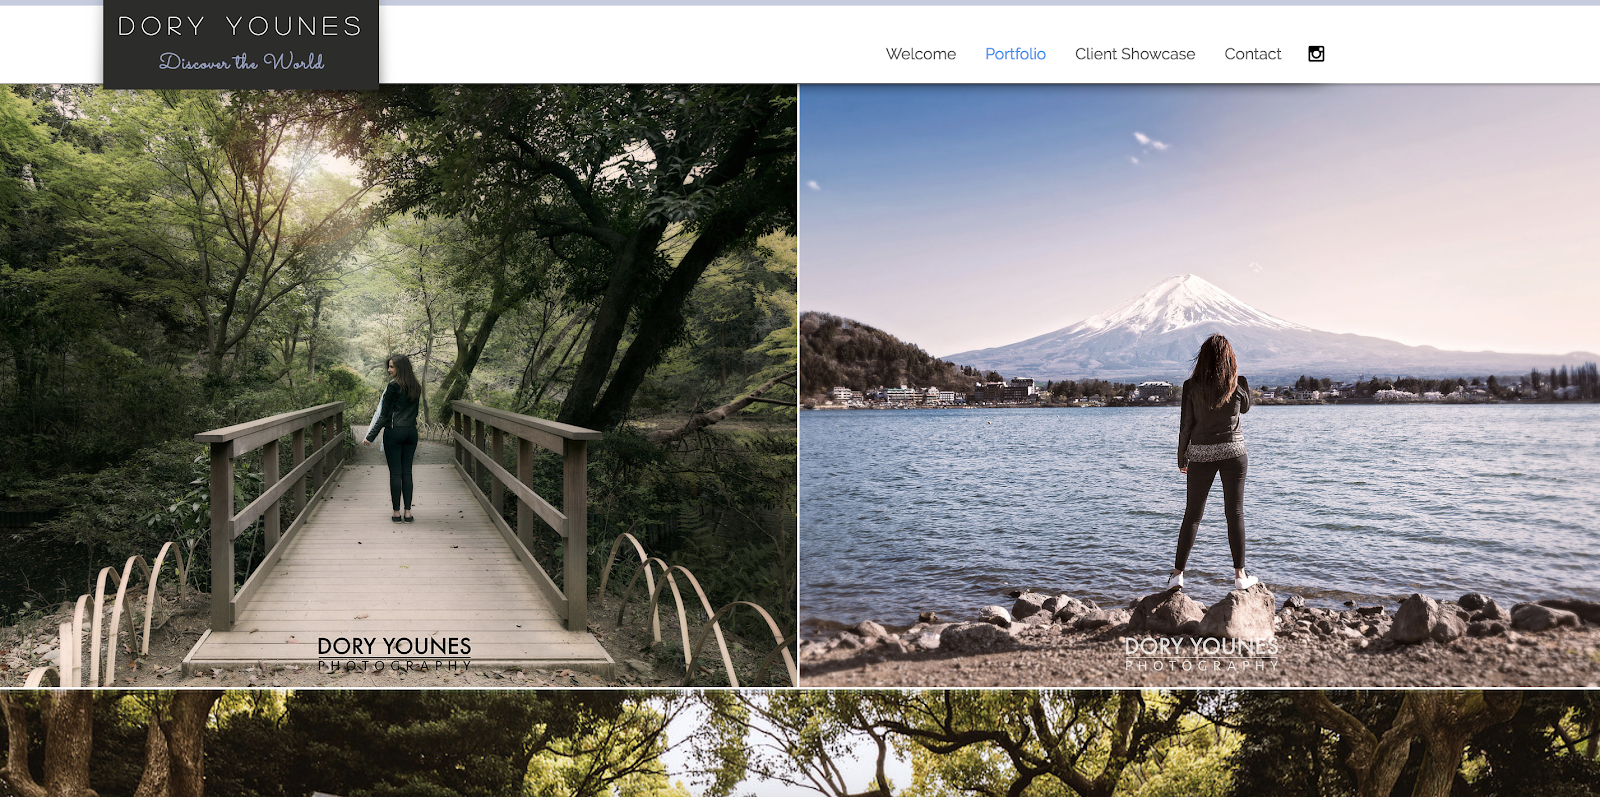 12 Memorable Photography Portfolio Websites to Inspire You